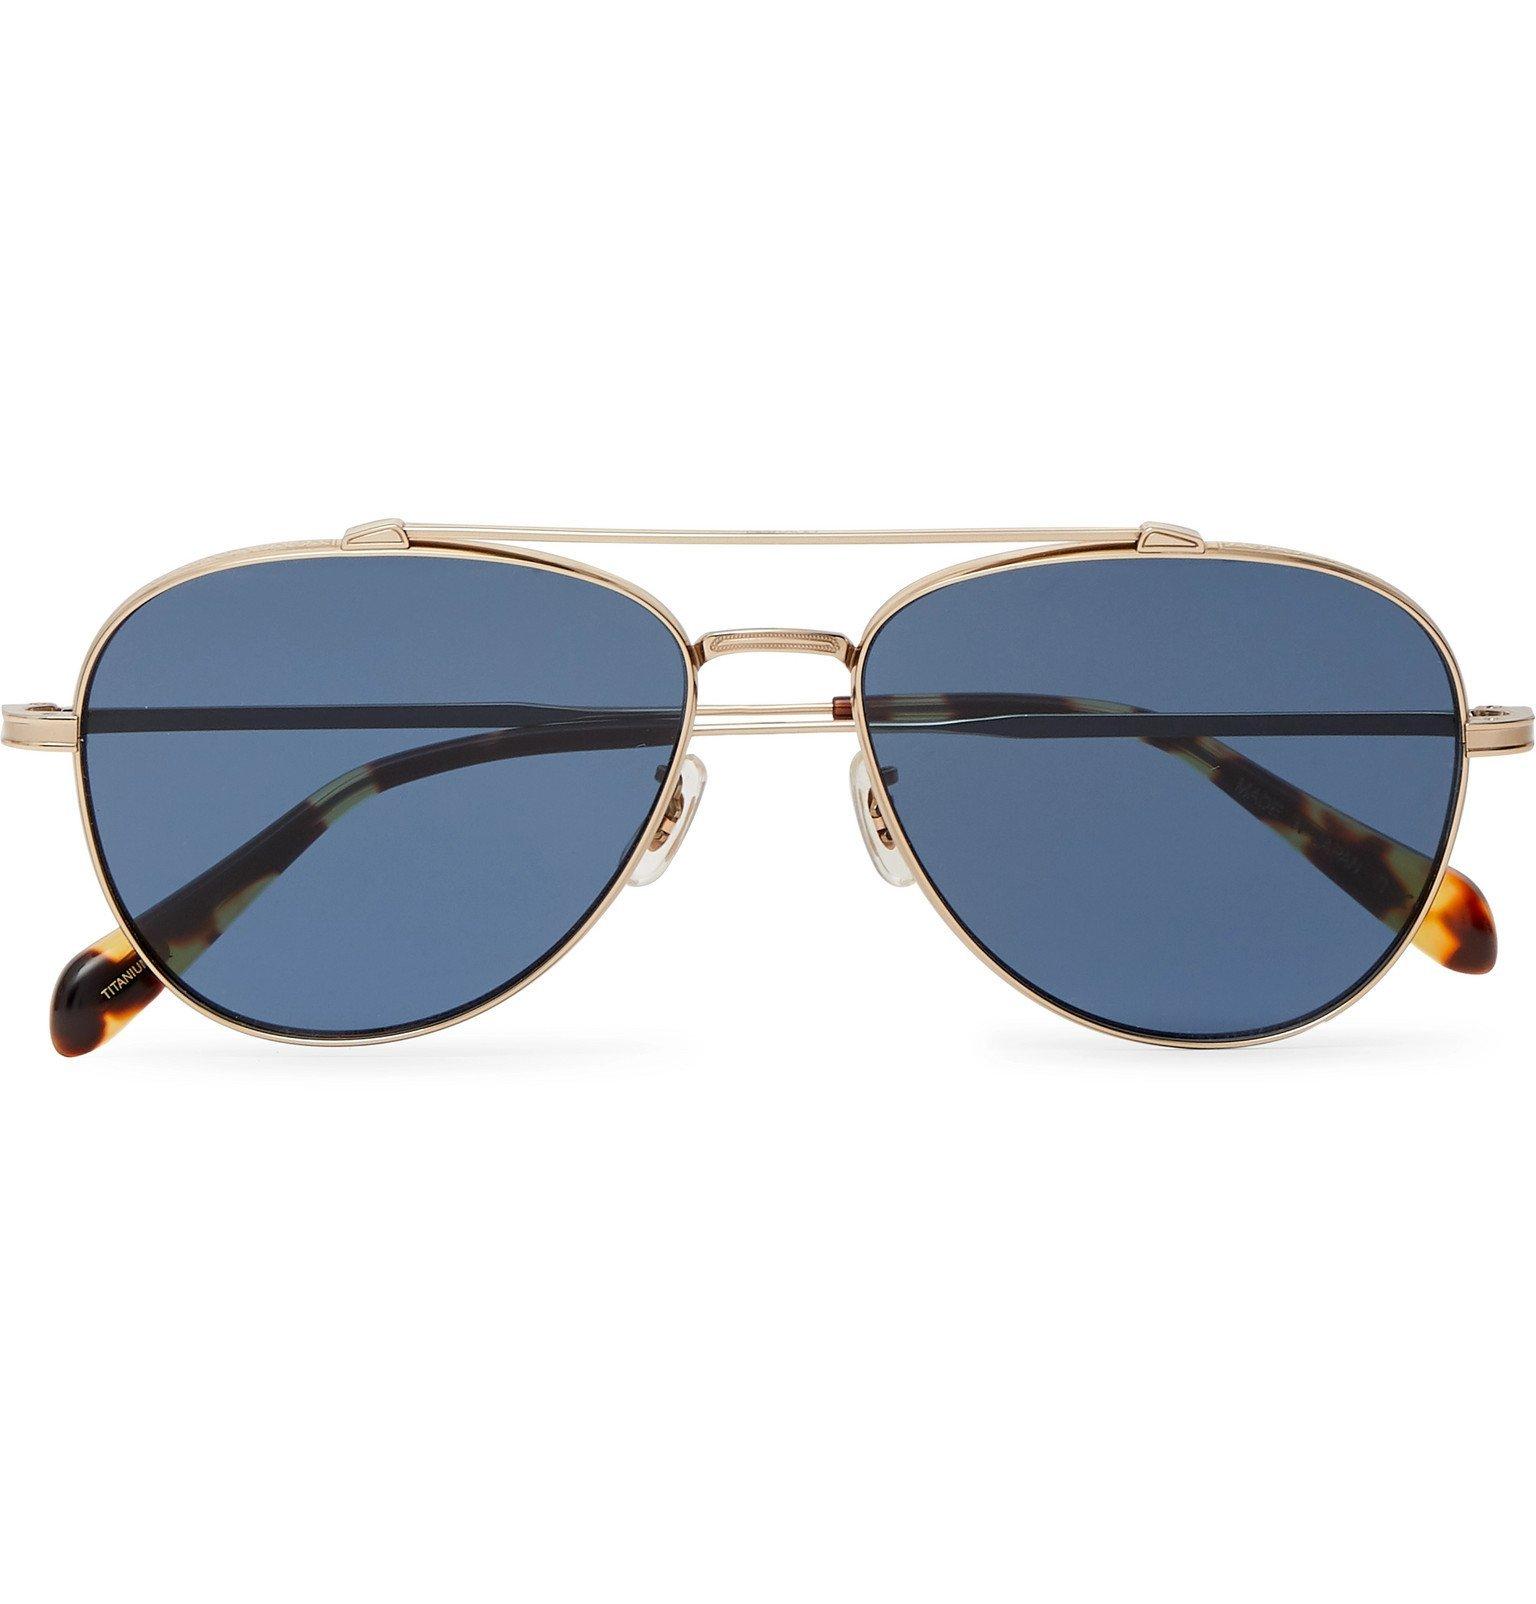 Oliver Peoples - Rikson Aviator-Style Silver-Tone Titanium and Tortoiseshell Acetate Sunglasses - Gold